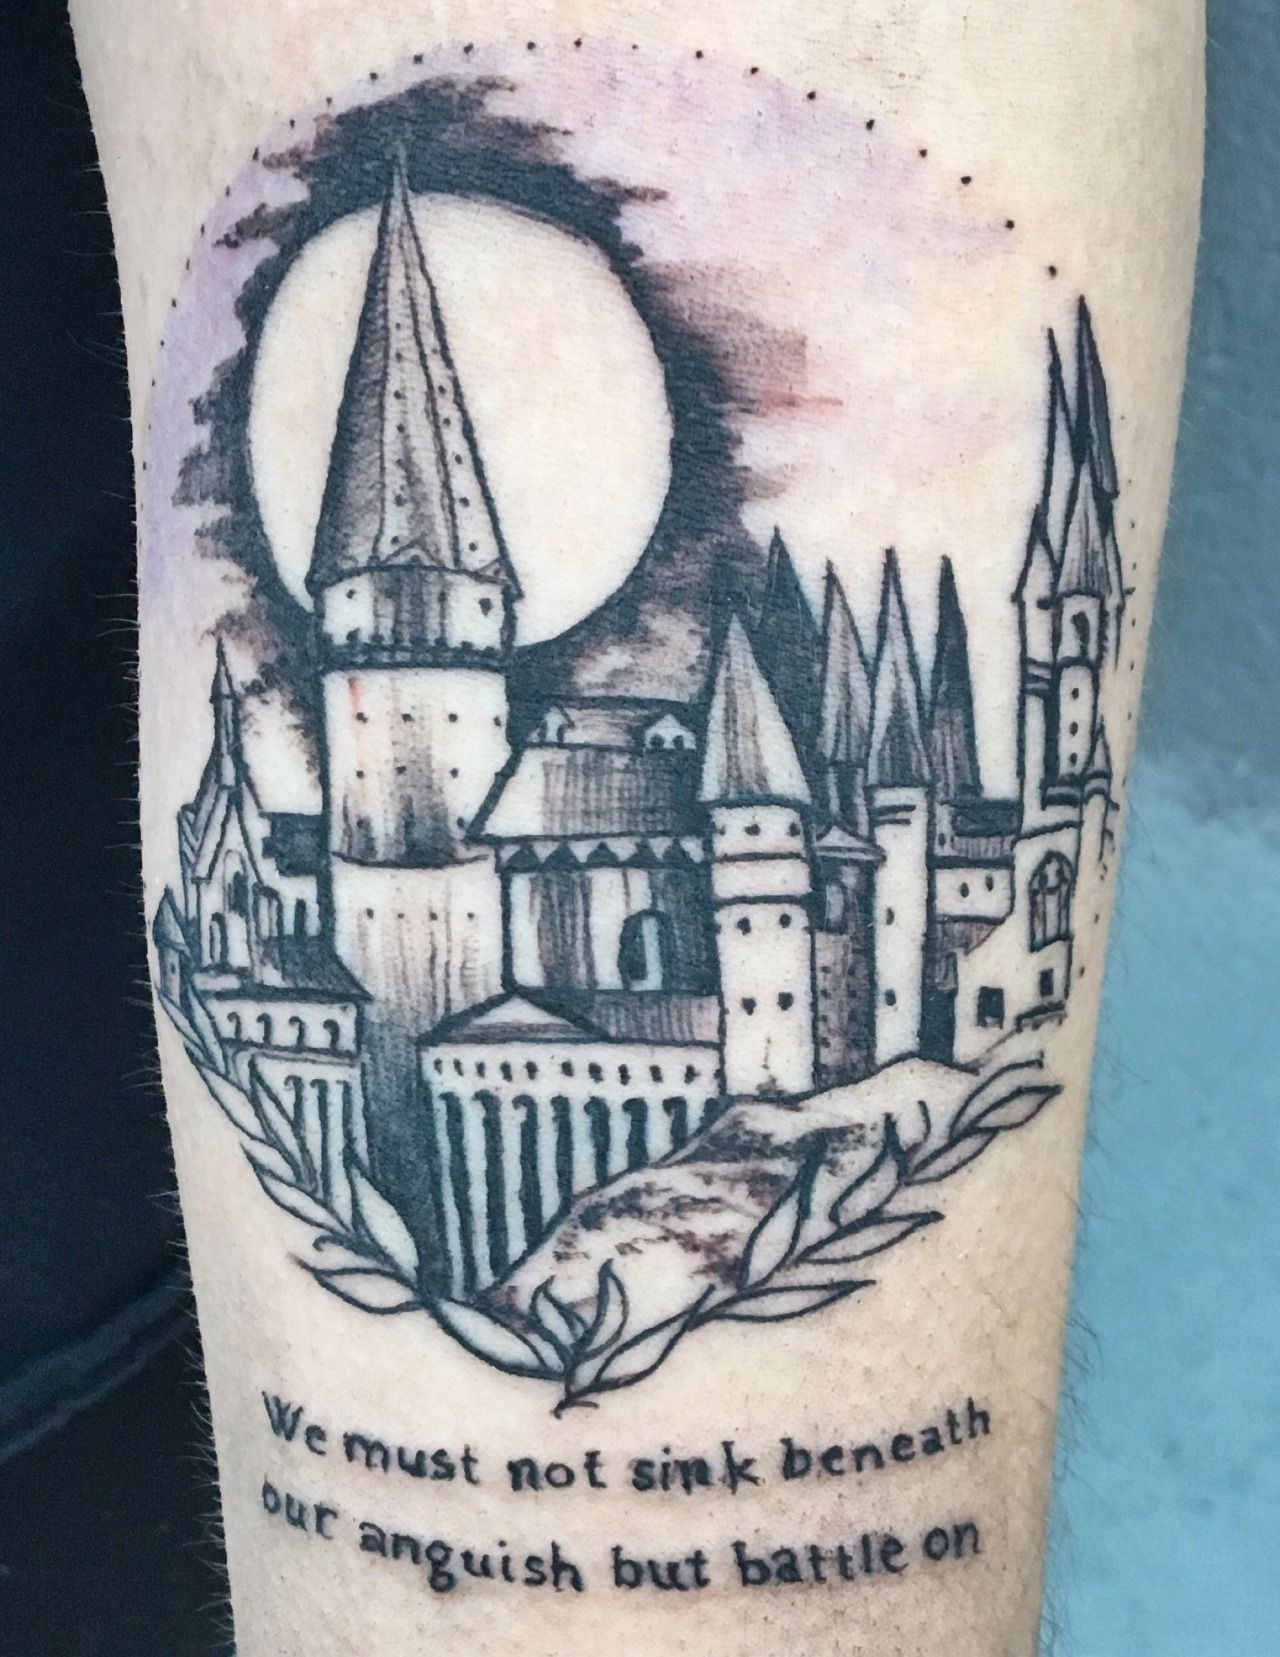 I tatuaggi più belli dedicati a Harry Potter